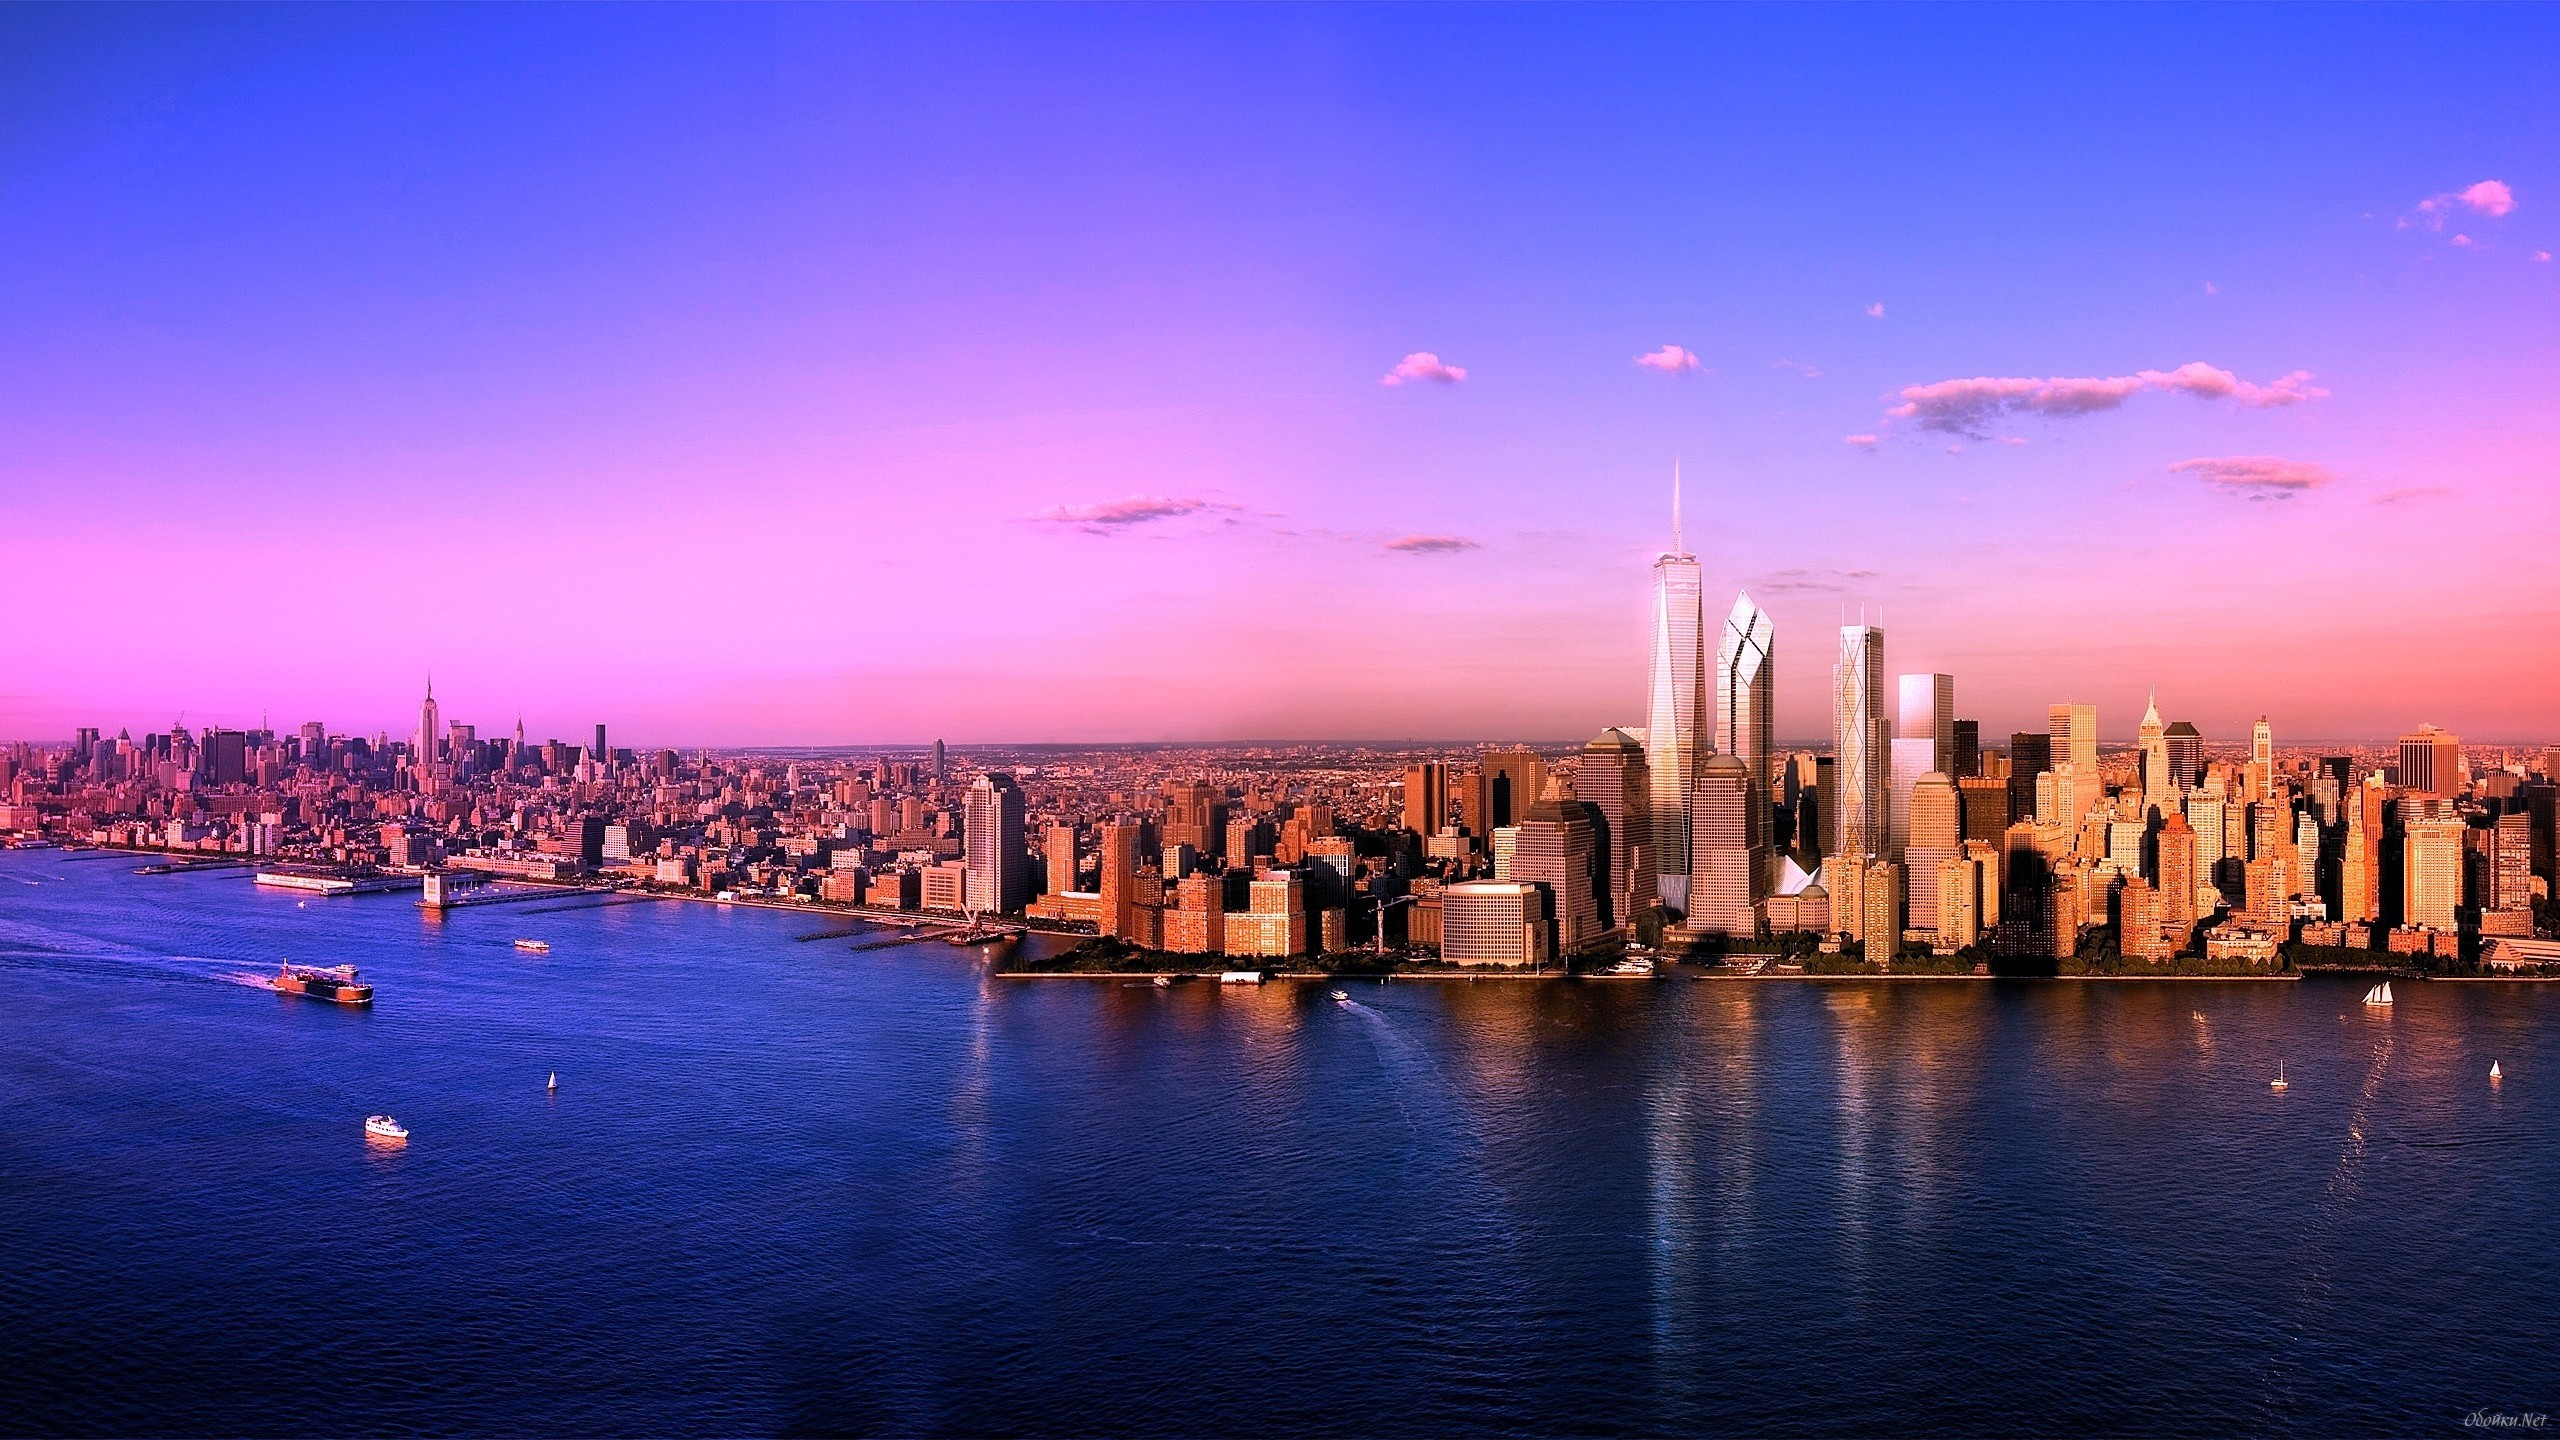 new york city desktop wallpaper ·① wallpapertag